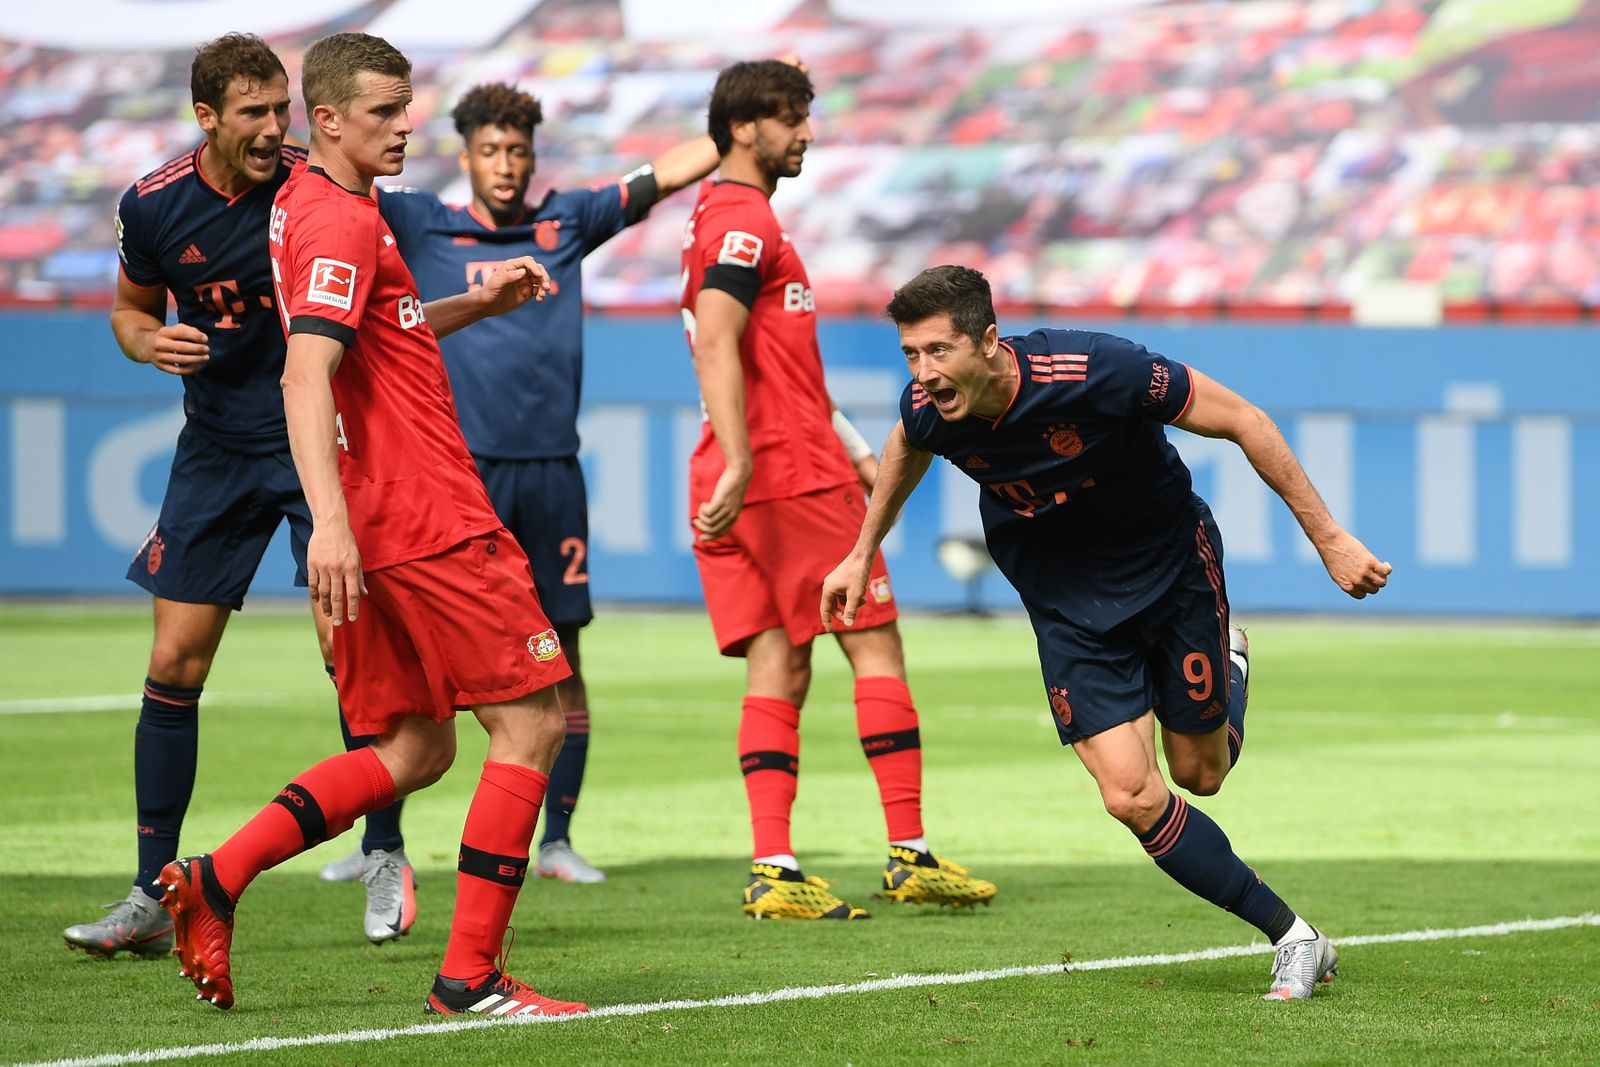 Bayer 04 Leverkusen v FC Bayern Munich, Germany - 06 Jun 2020